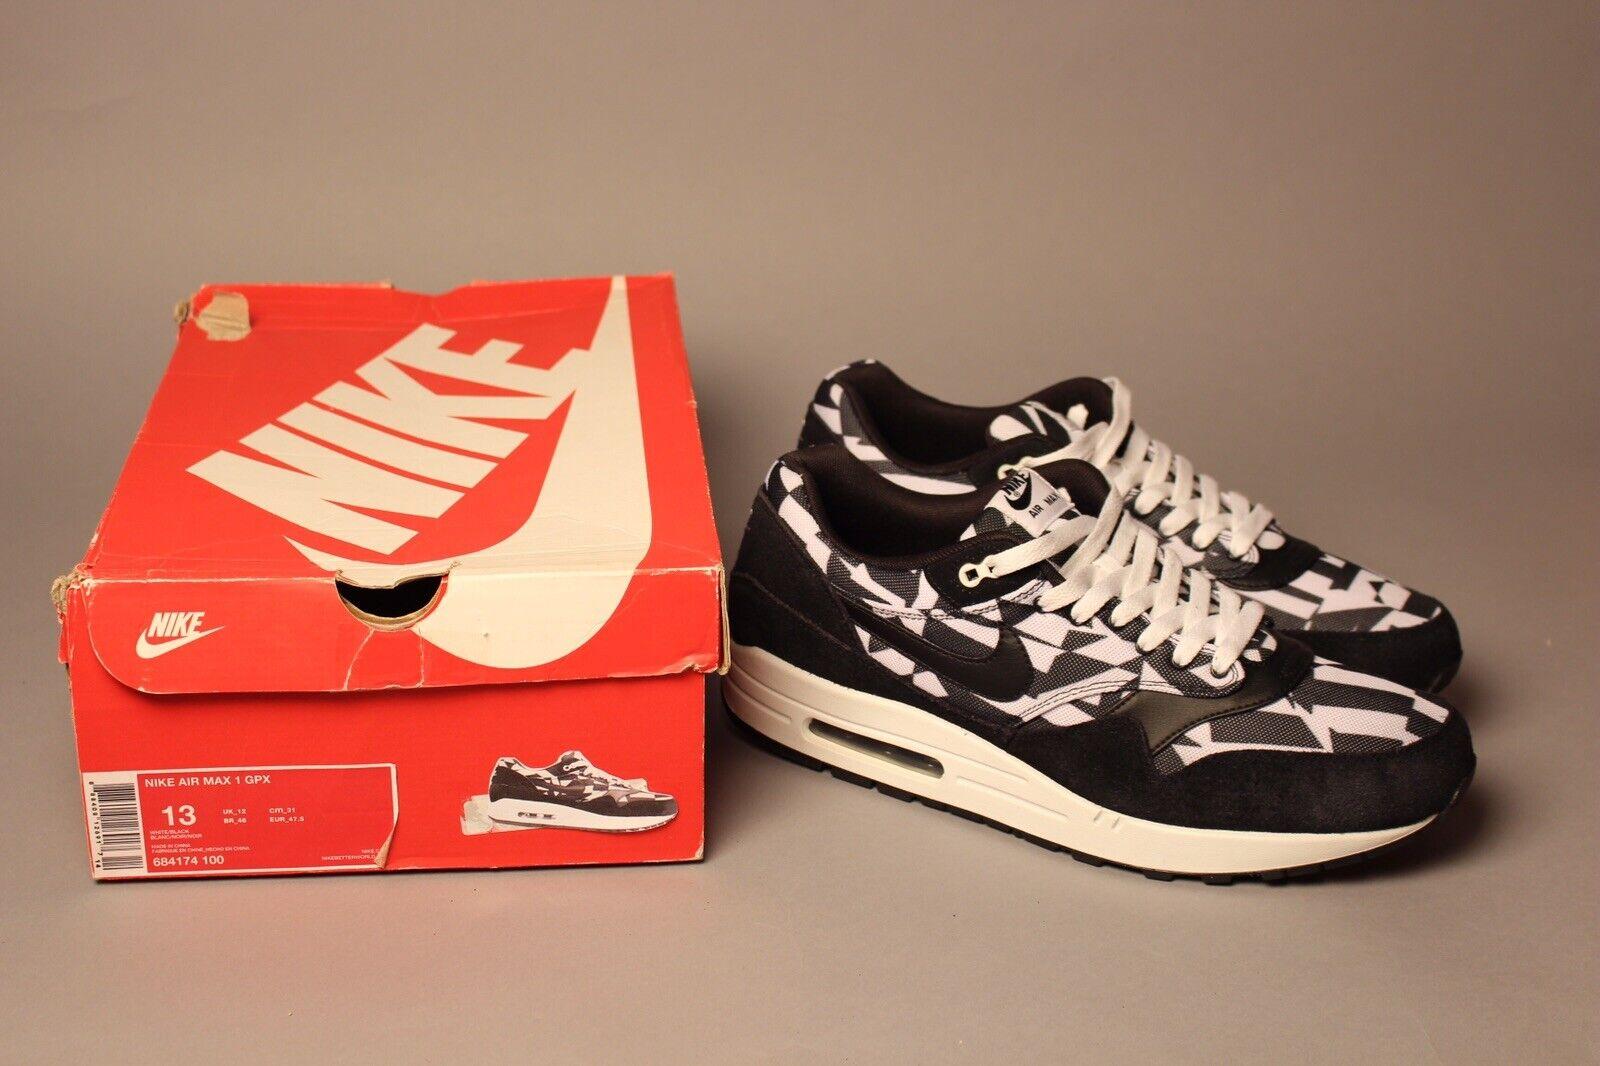 Nike Air Max 1 GPX Mens size 13 684174-100 Dazzle Black White